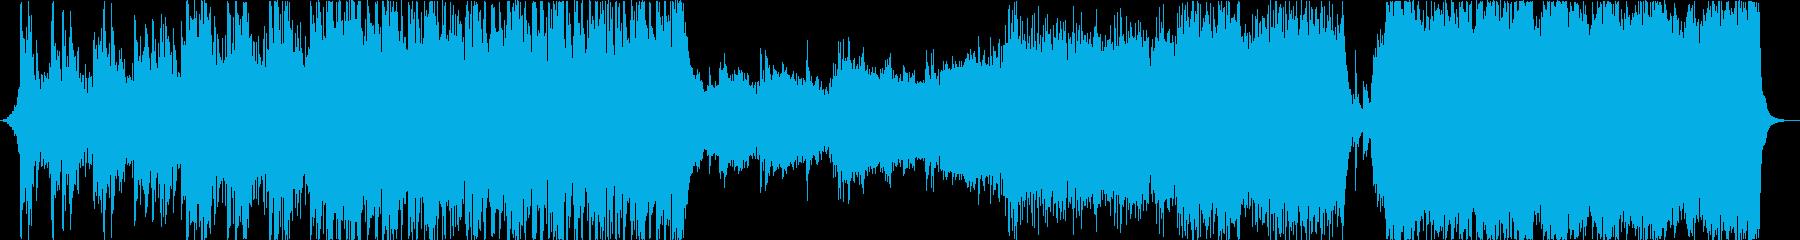 SF映画の予告をイメージしたサウンドの再生済みの波形